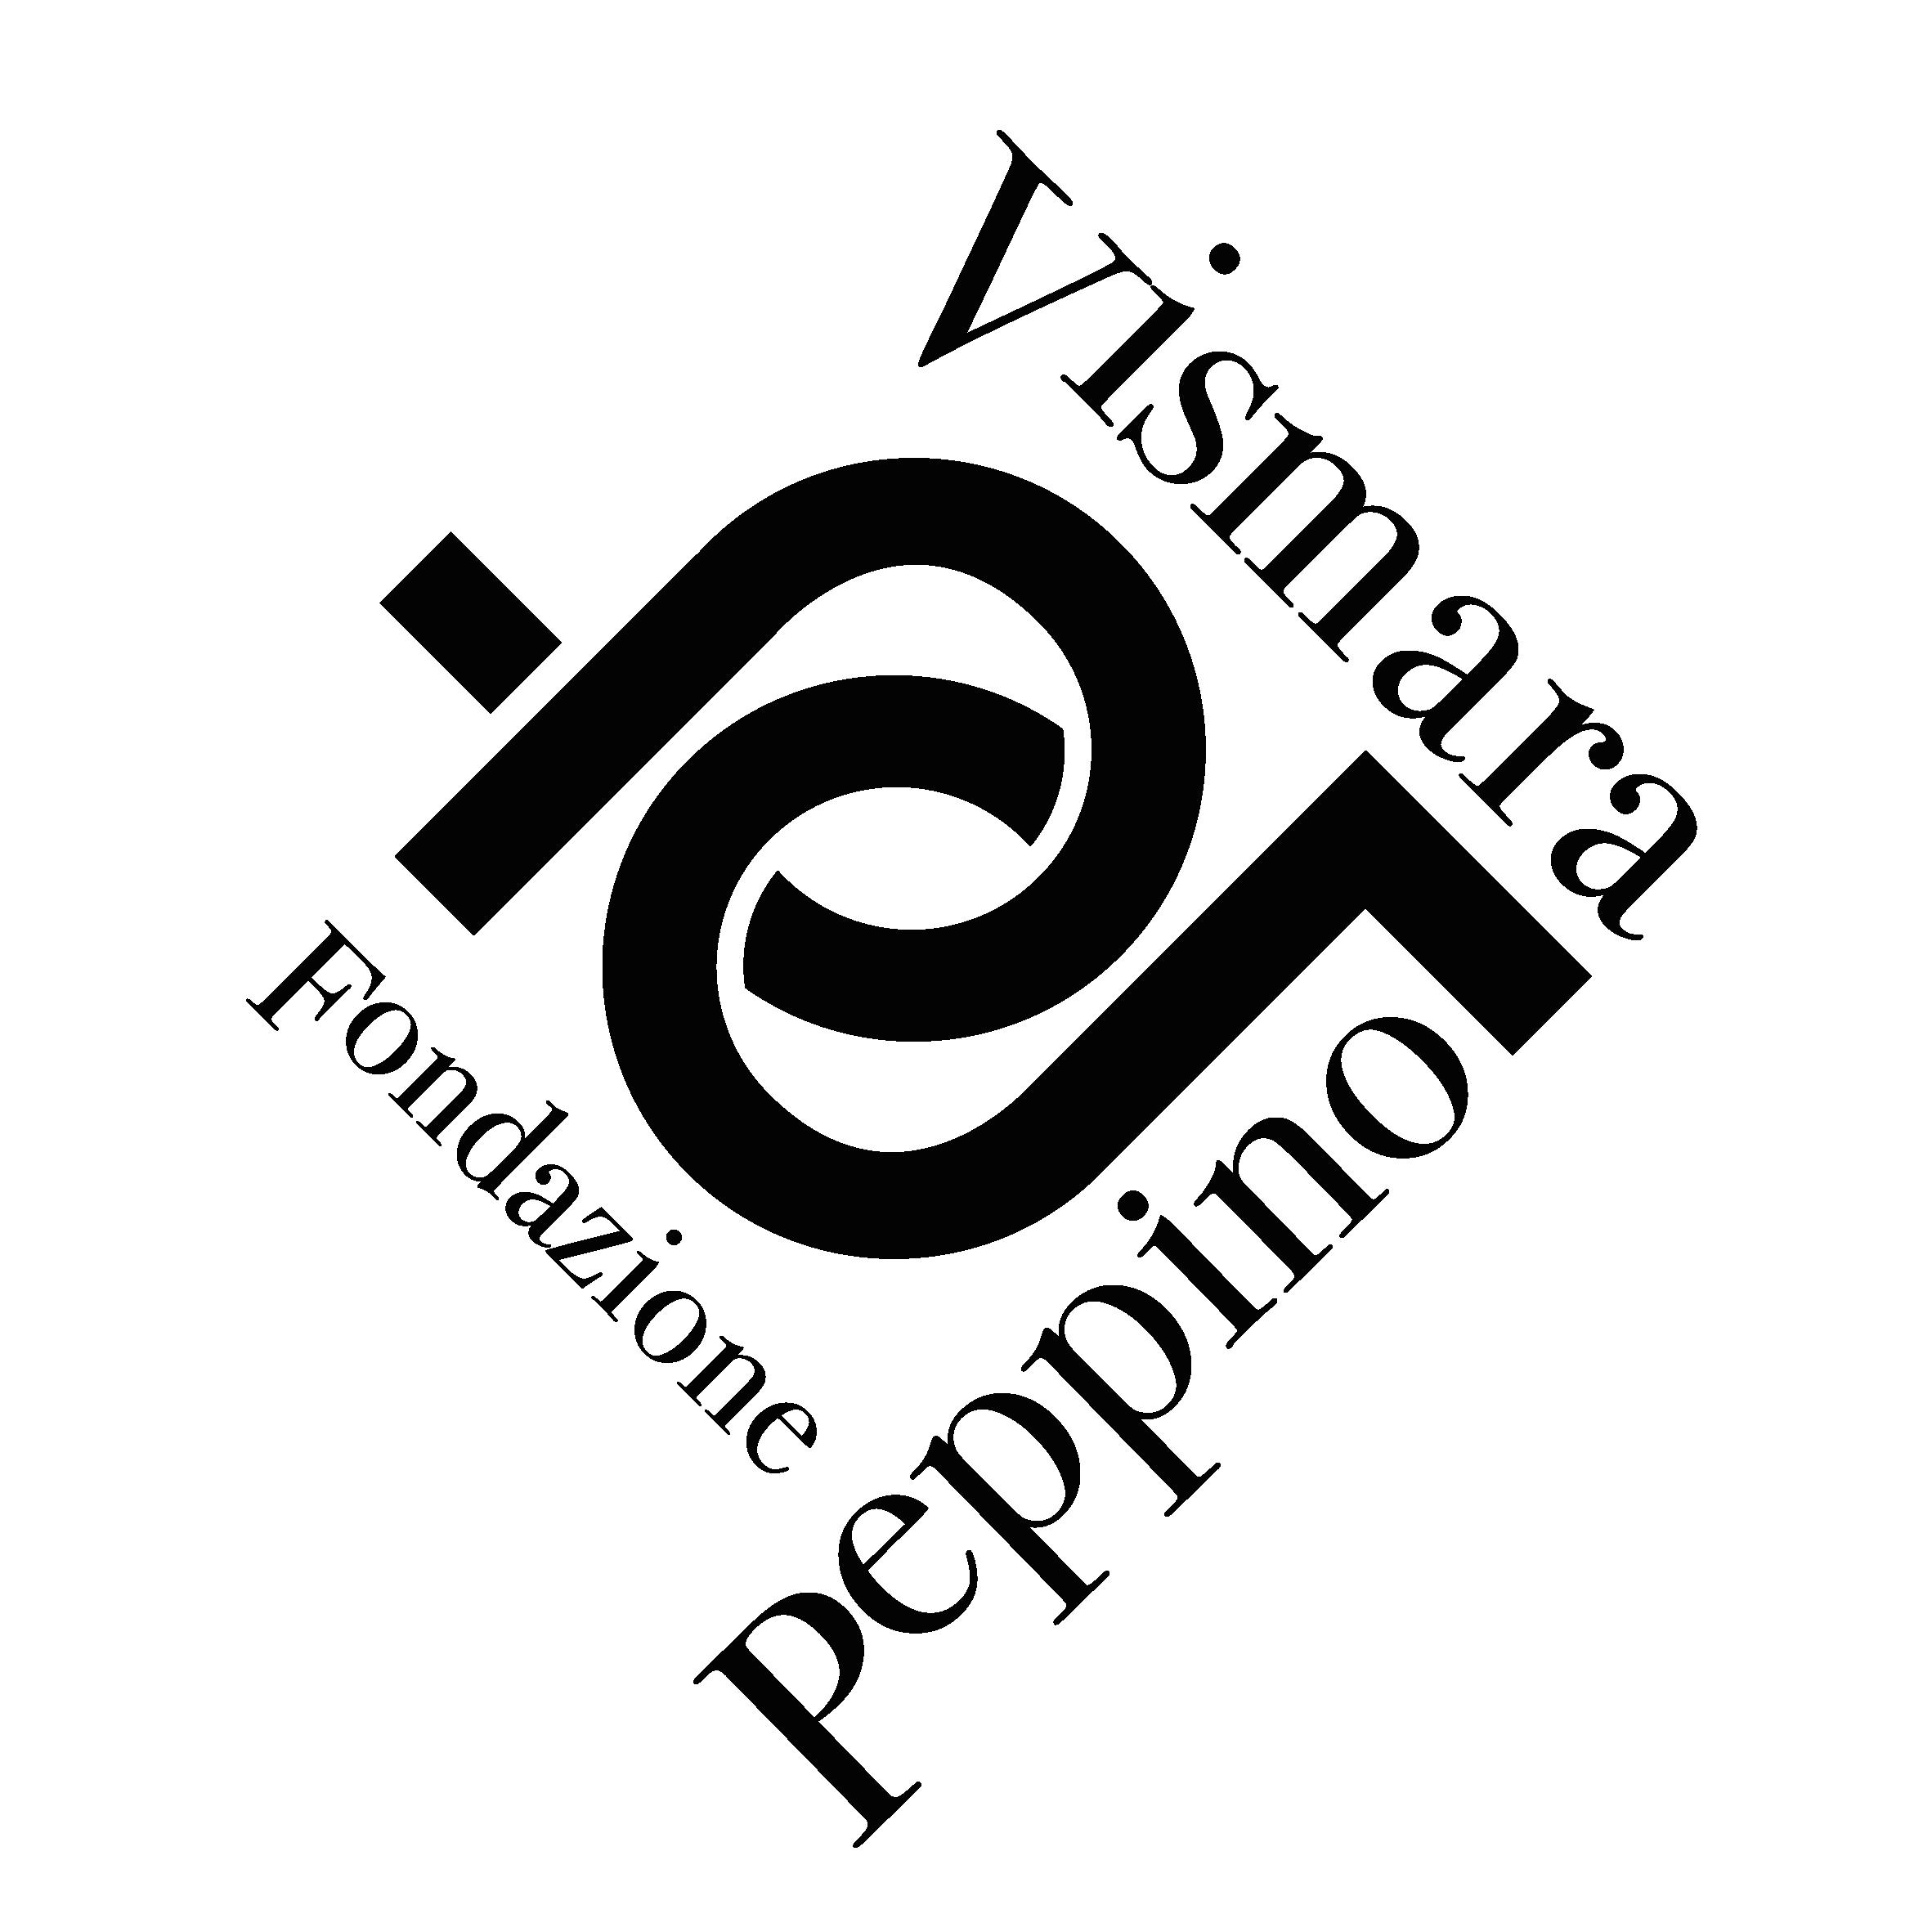 Fondazione Vismara partner Linecheck